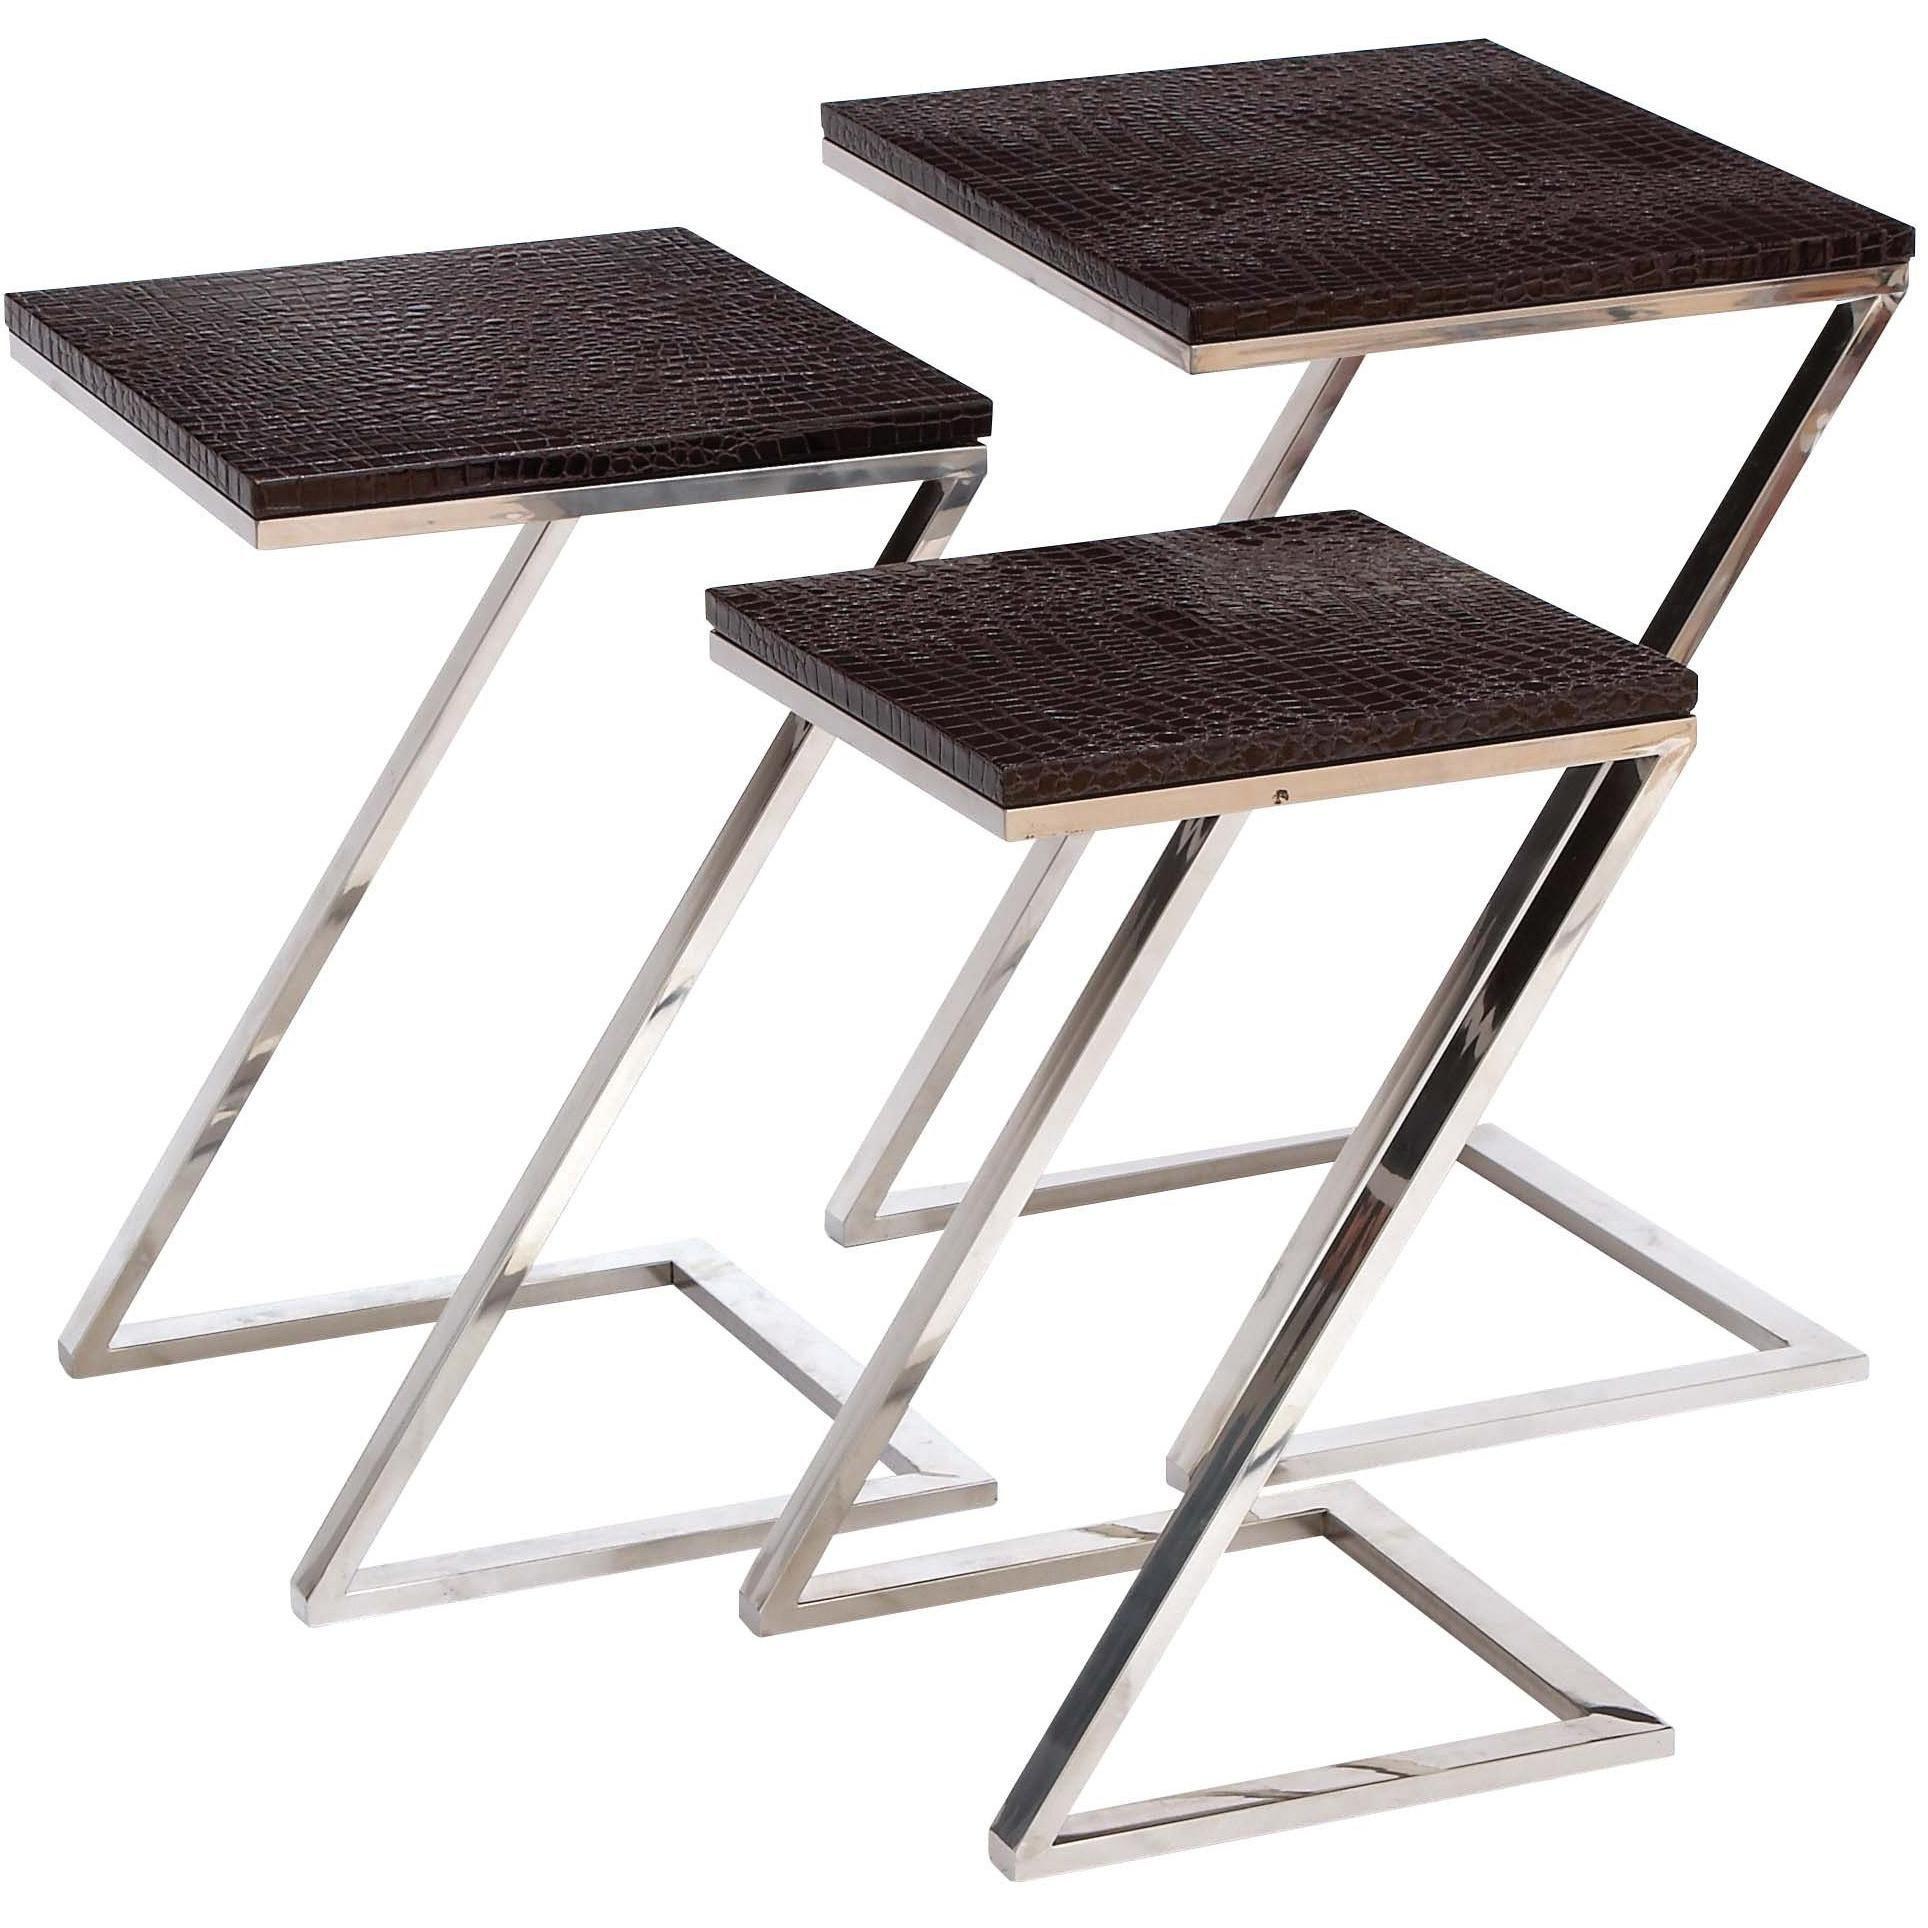 Empire Art Black On Blue Metallic Shagreen Leather Nesting Z Base Tables